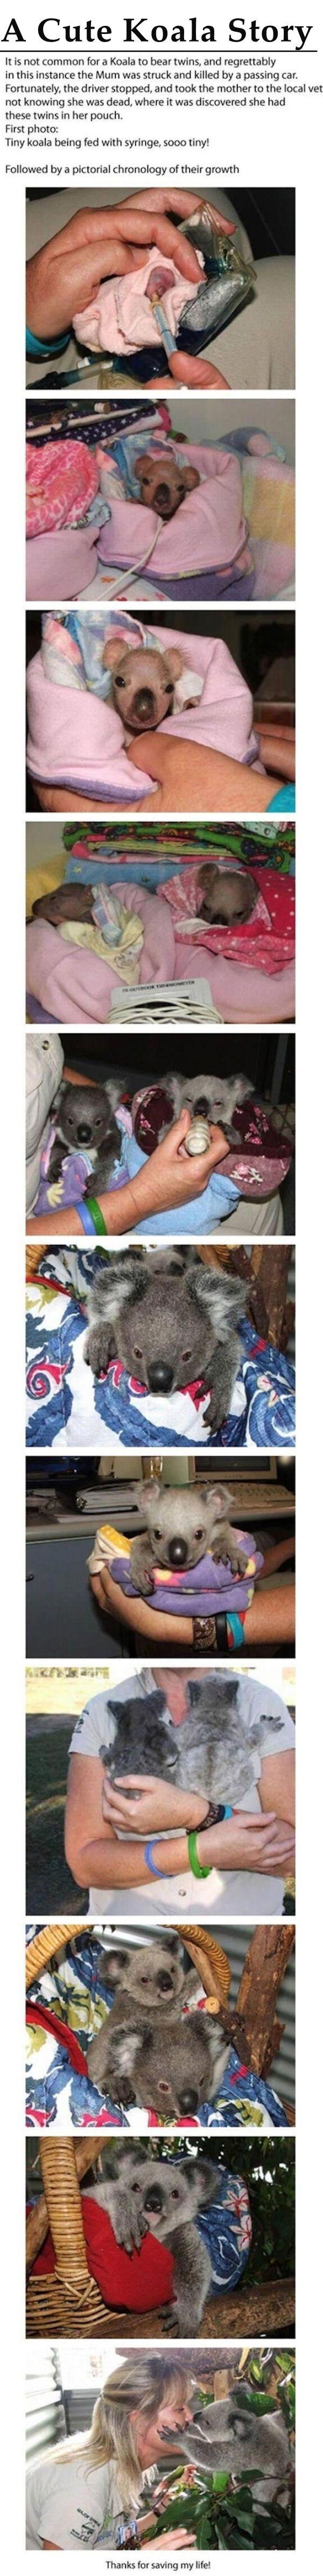 A Cute Koala Story cute animals adorable story animal baby animals koalas stories heart warming